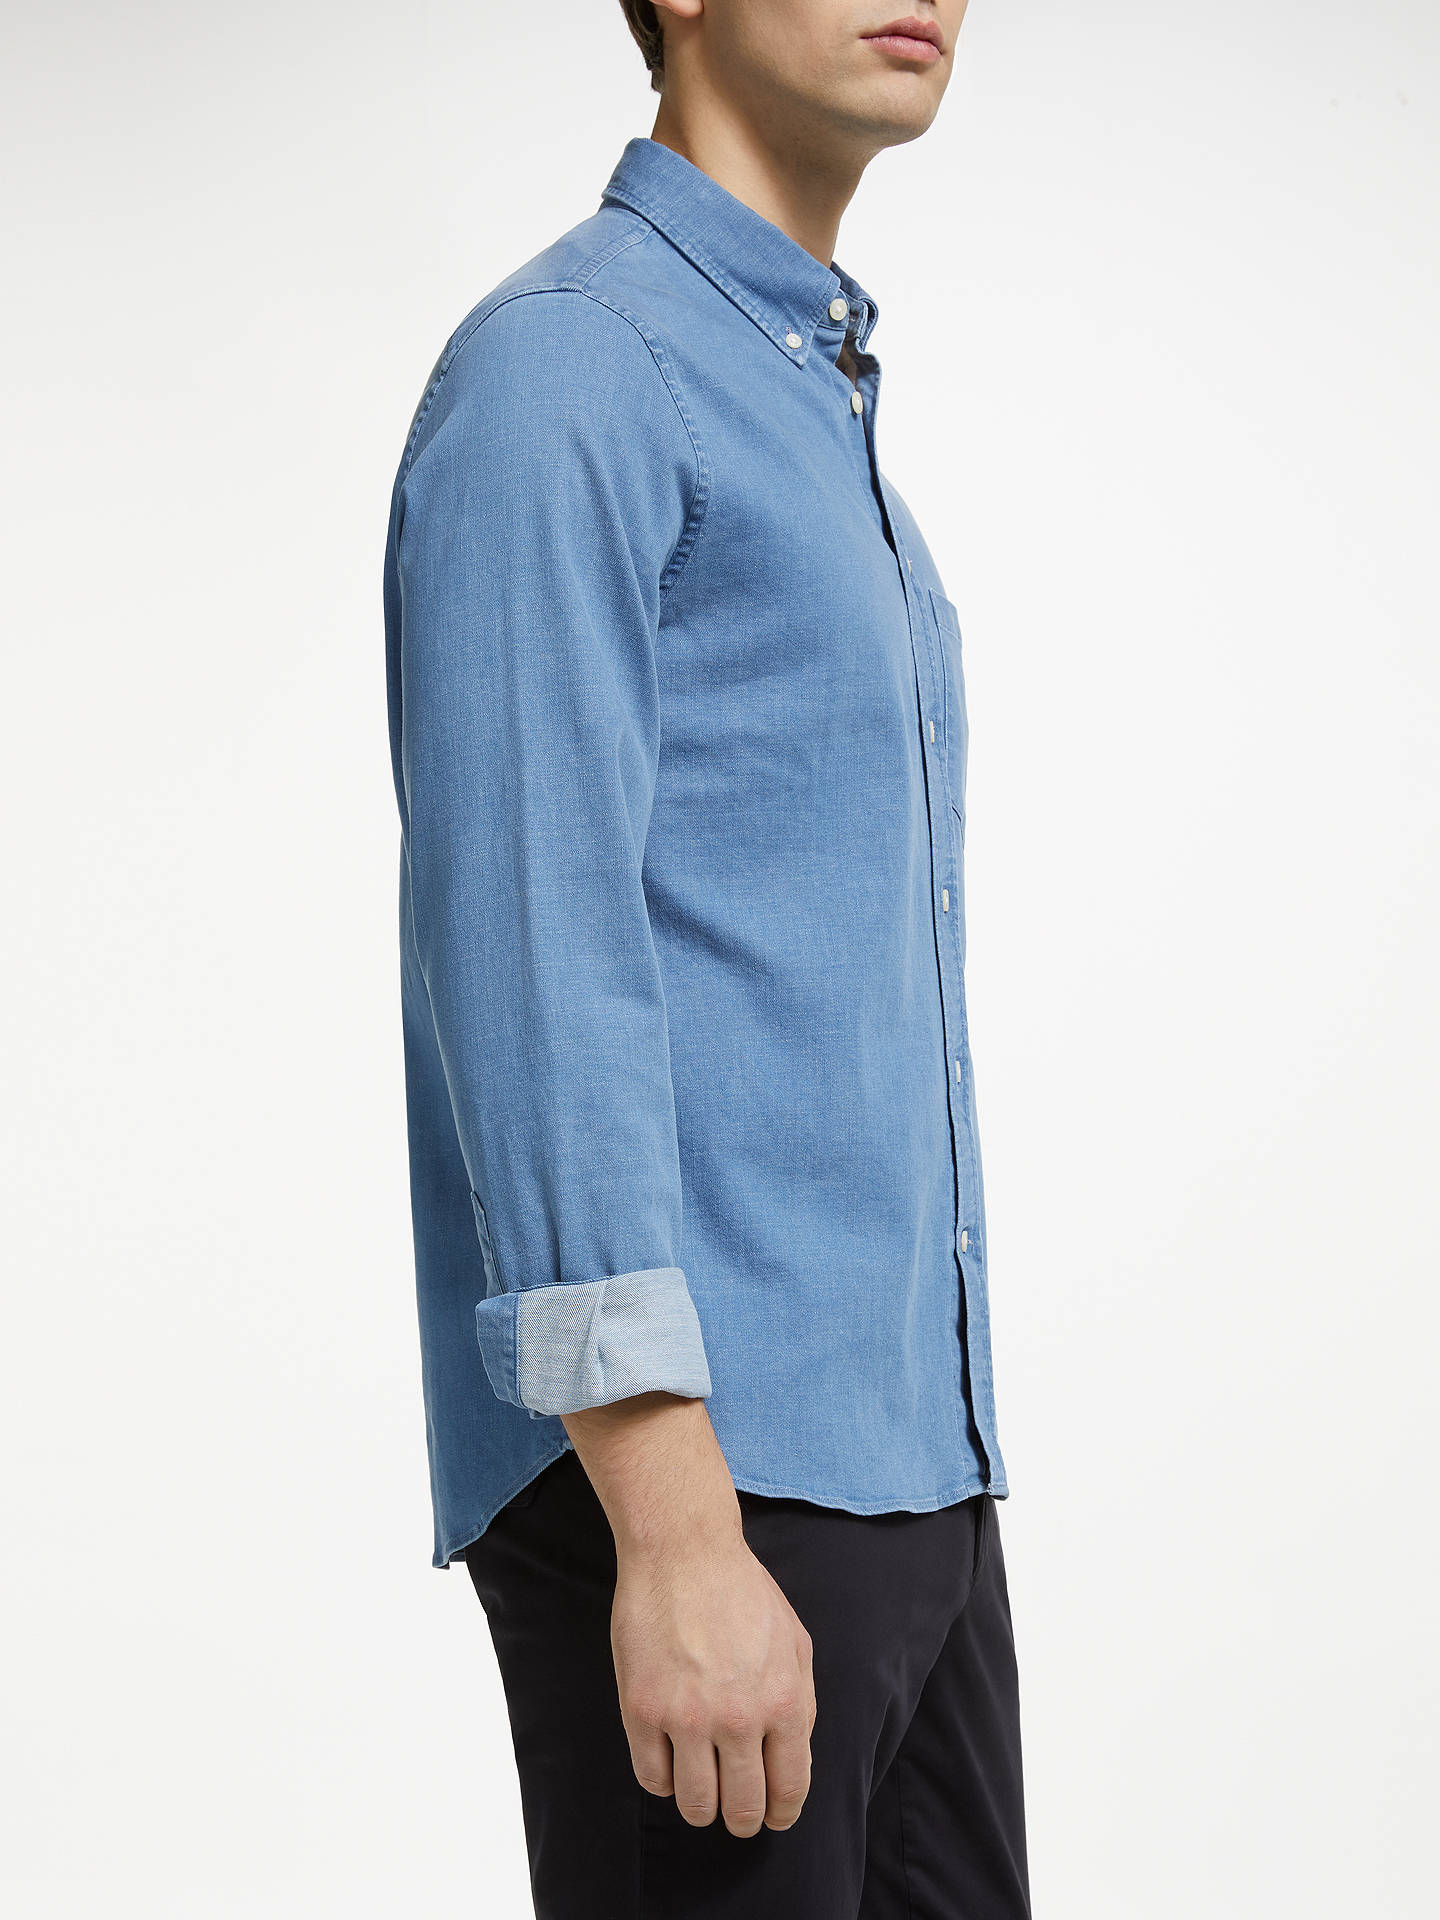 J.Lindeberg Mens Stretch Denim Shirt